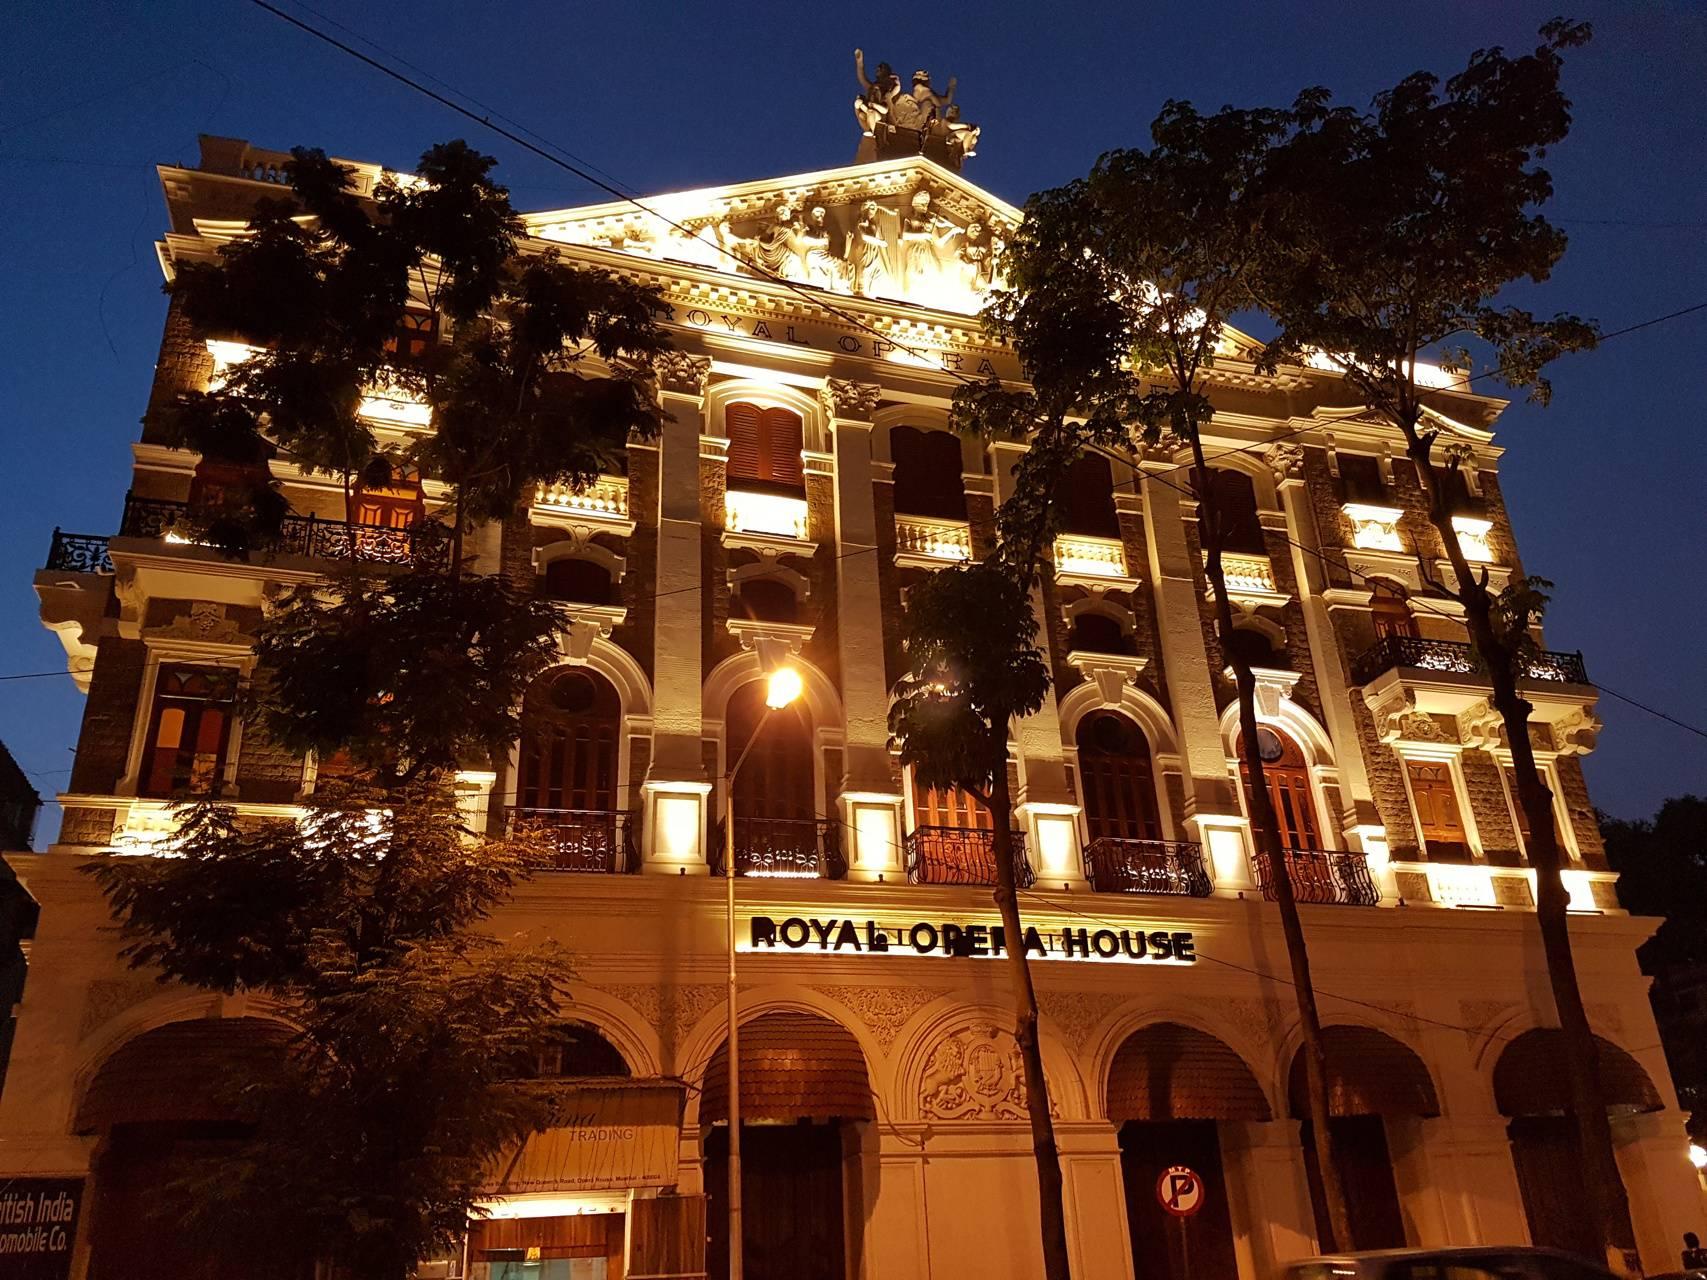 Opera house mumbai